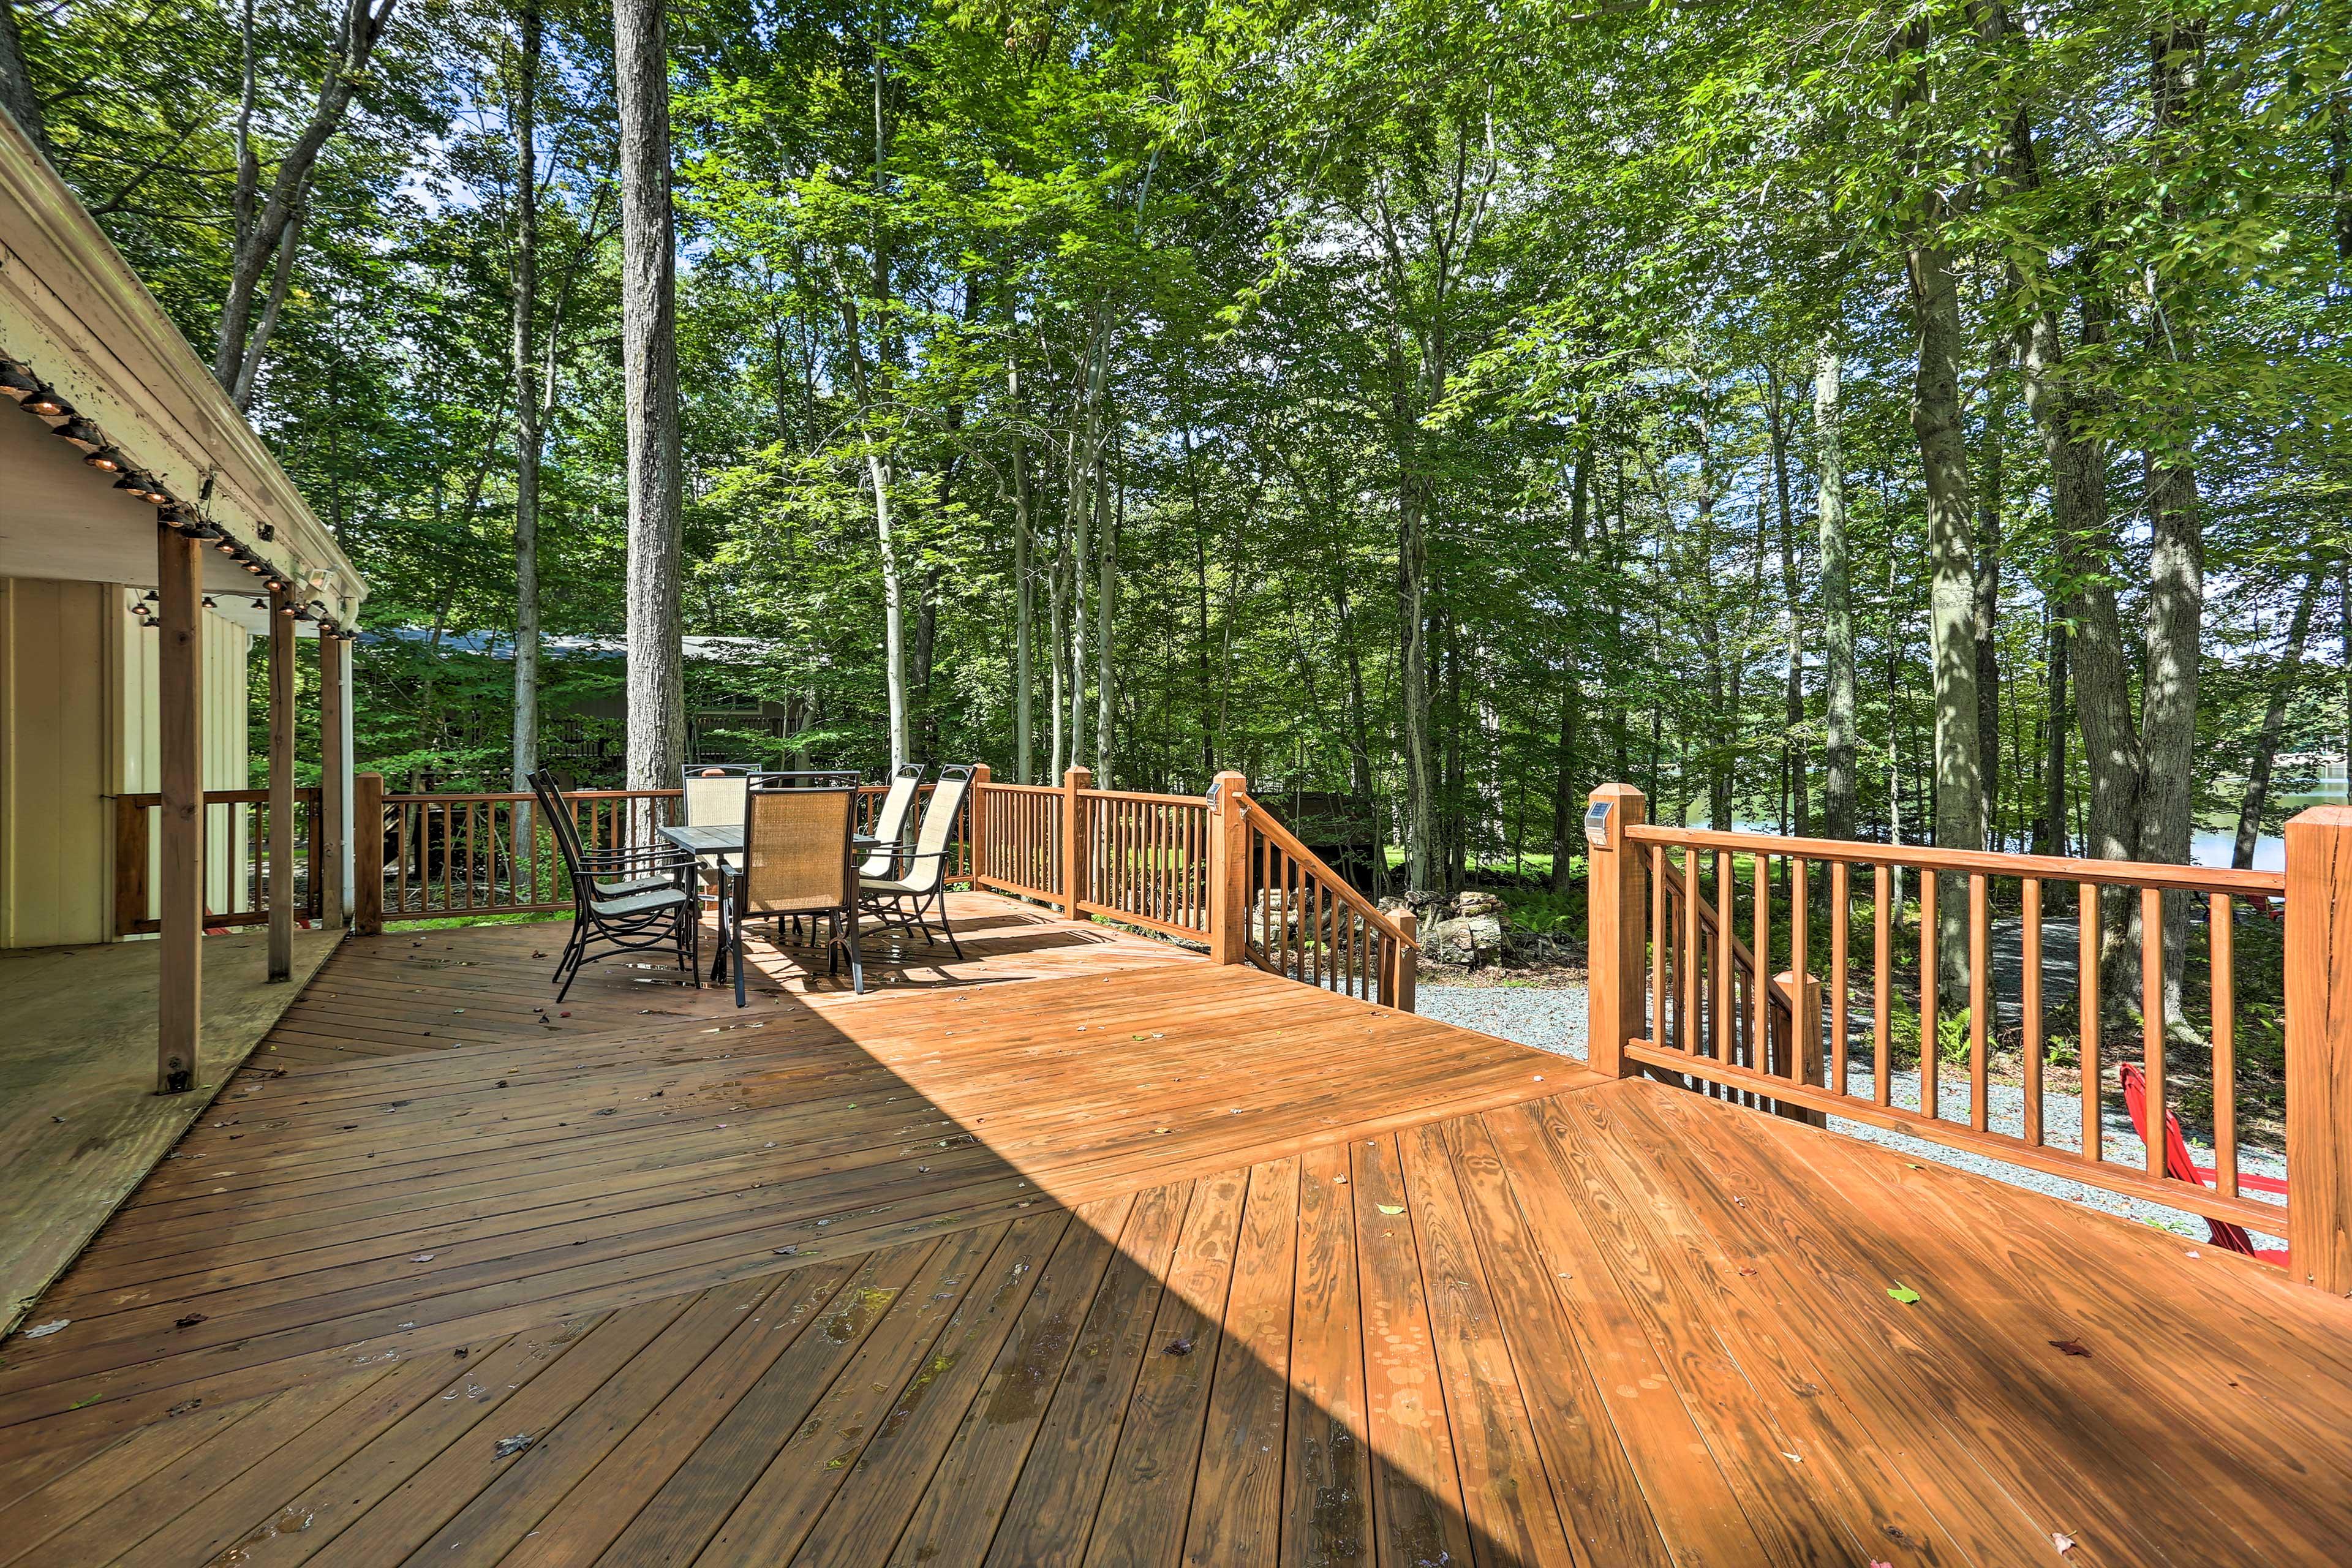 Soak up the sun on the spacious deck.